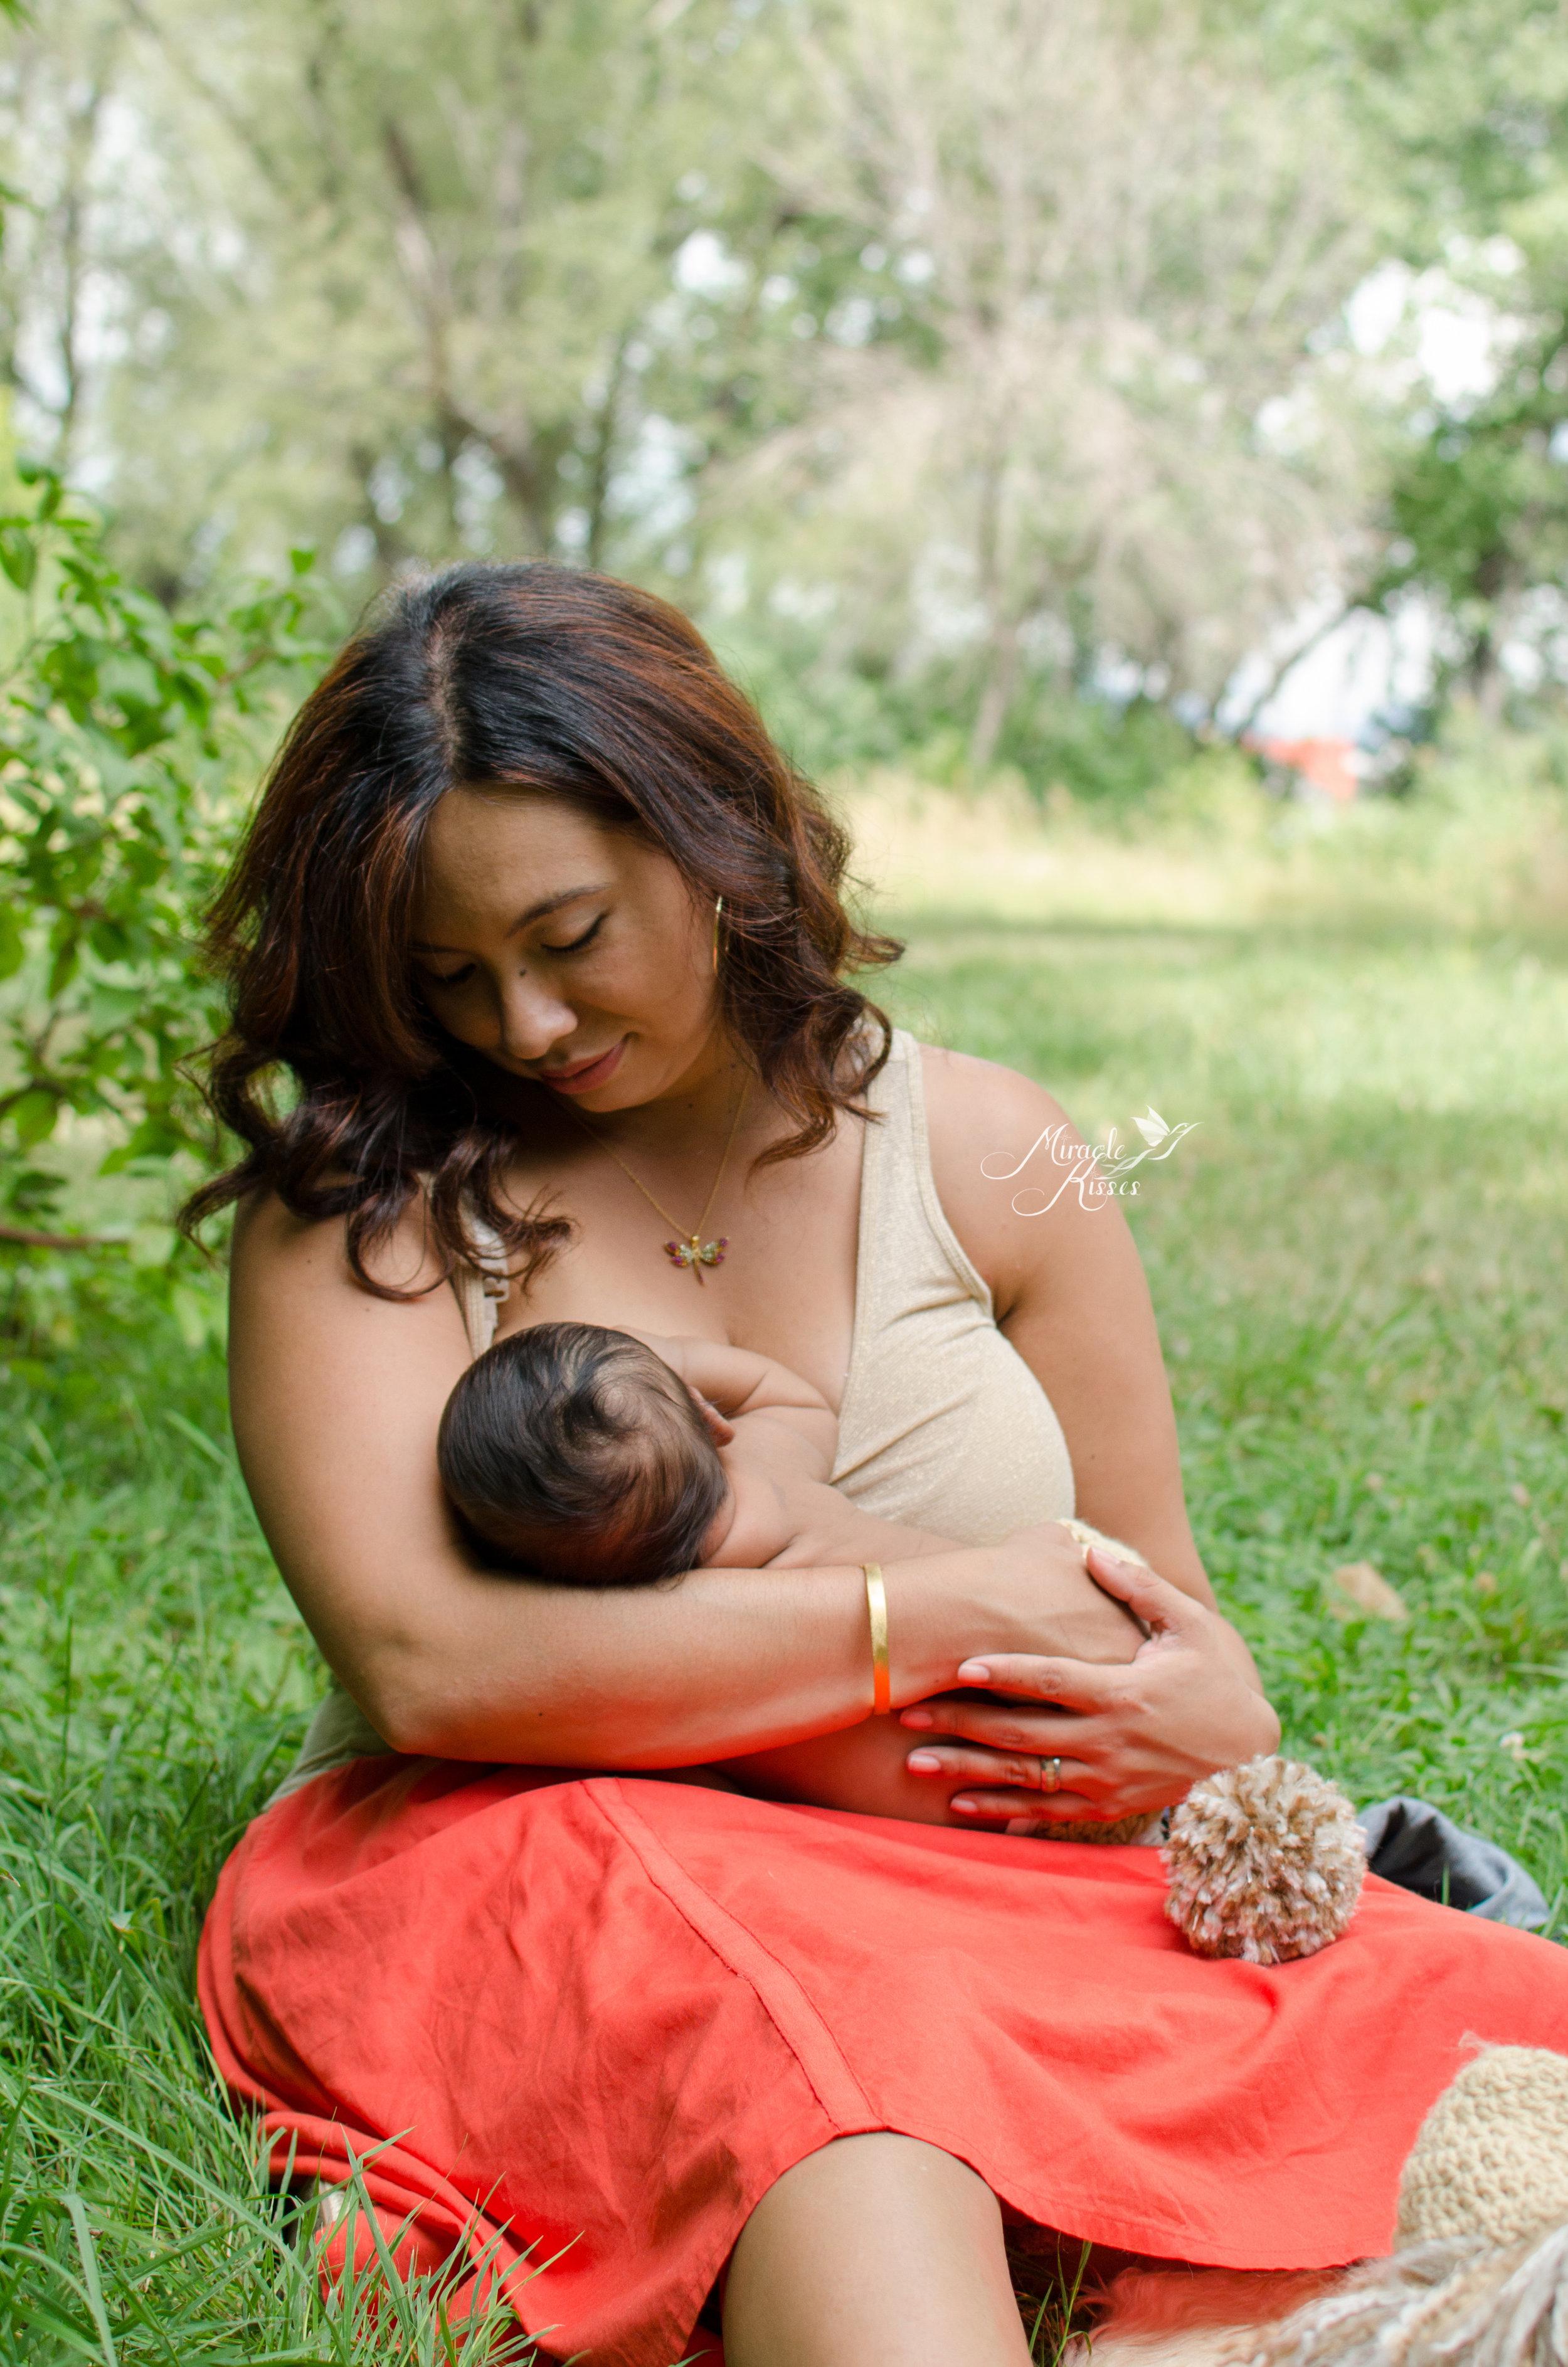 nursing in public, goals, nourishing the next generation, 31 days 31 stories